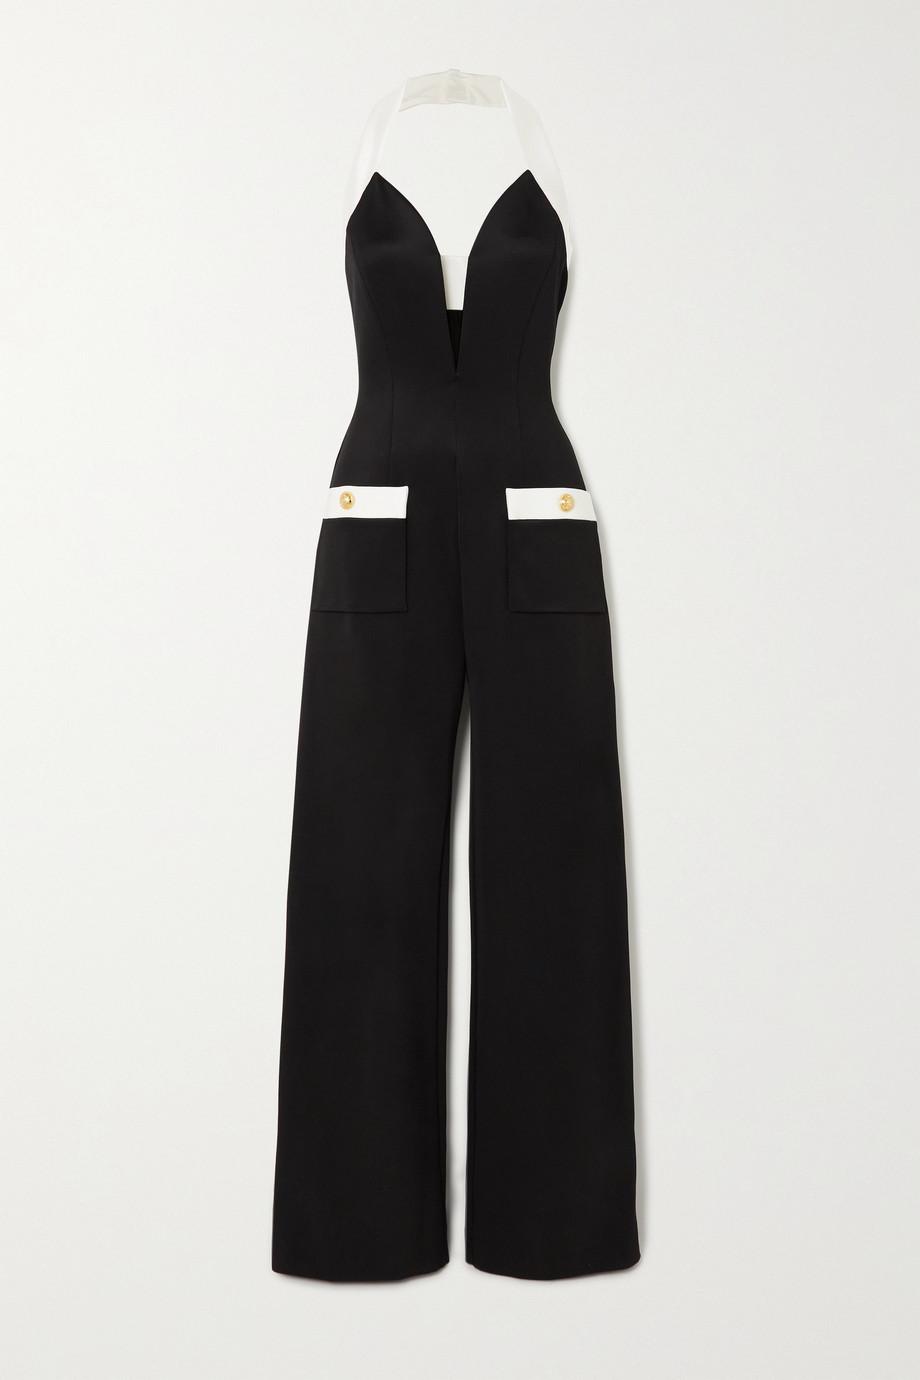 Balmain Combi-pantalon dos nu en jersey stretch bicolore